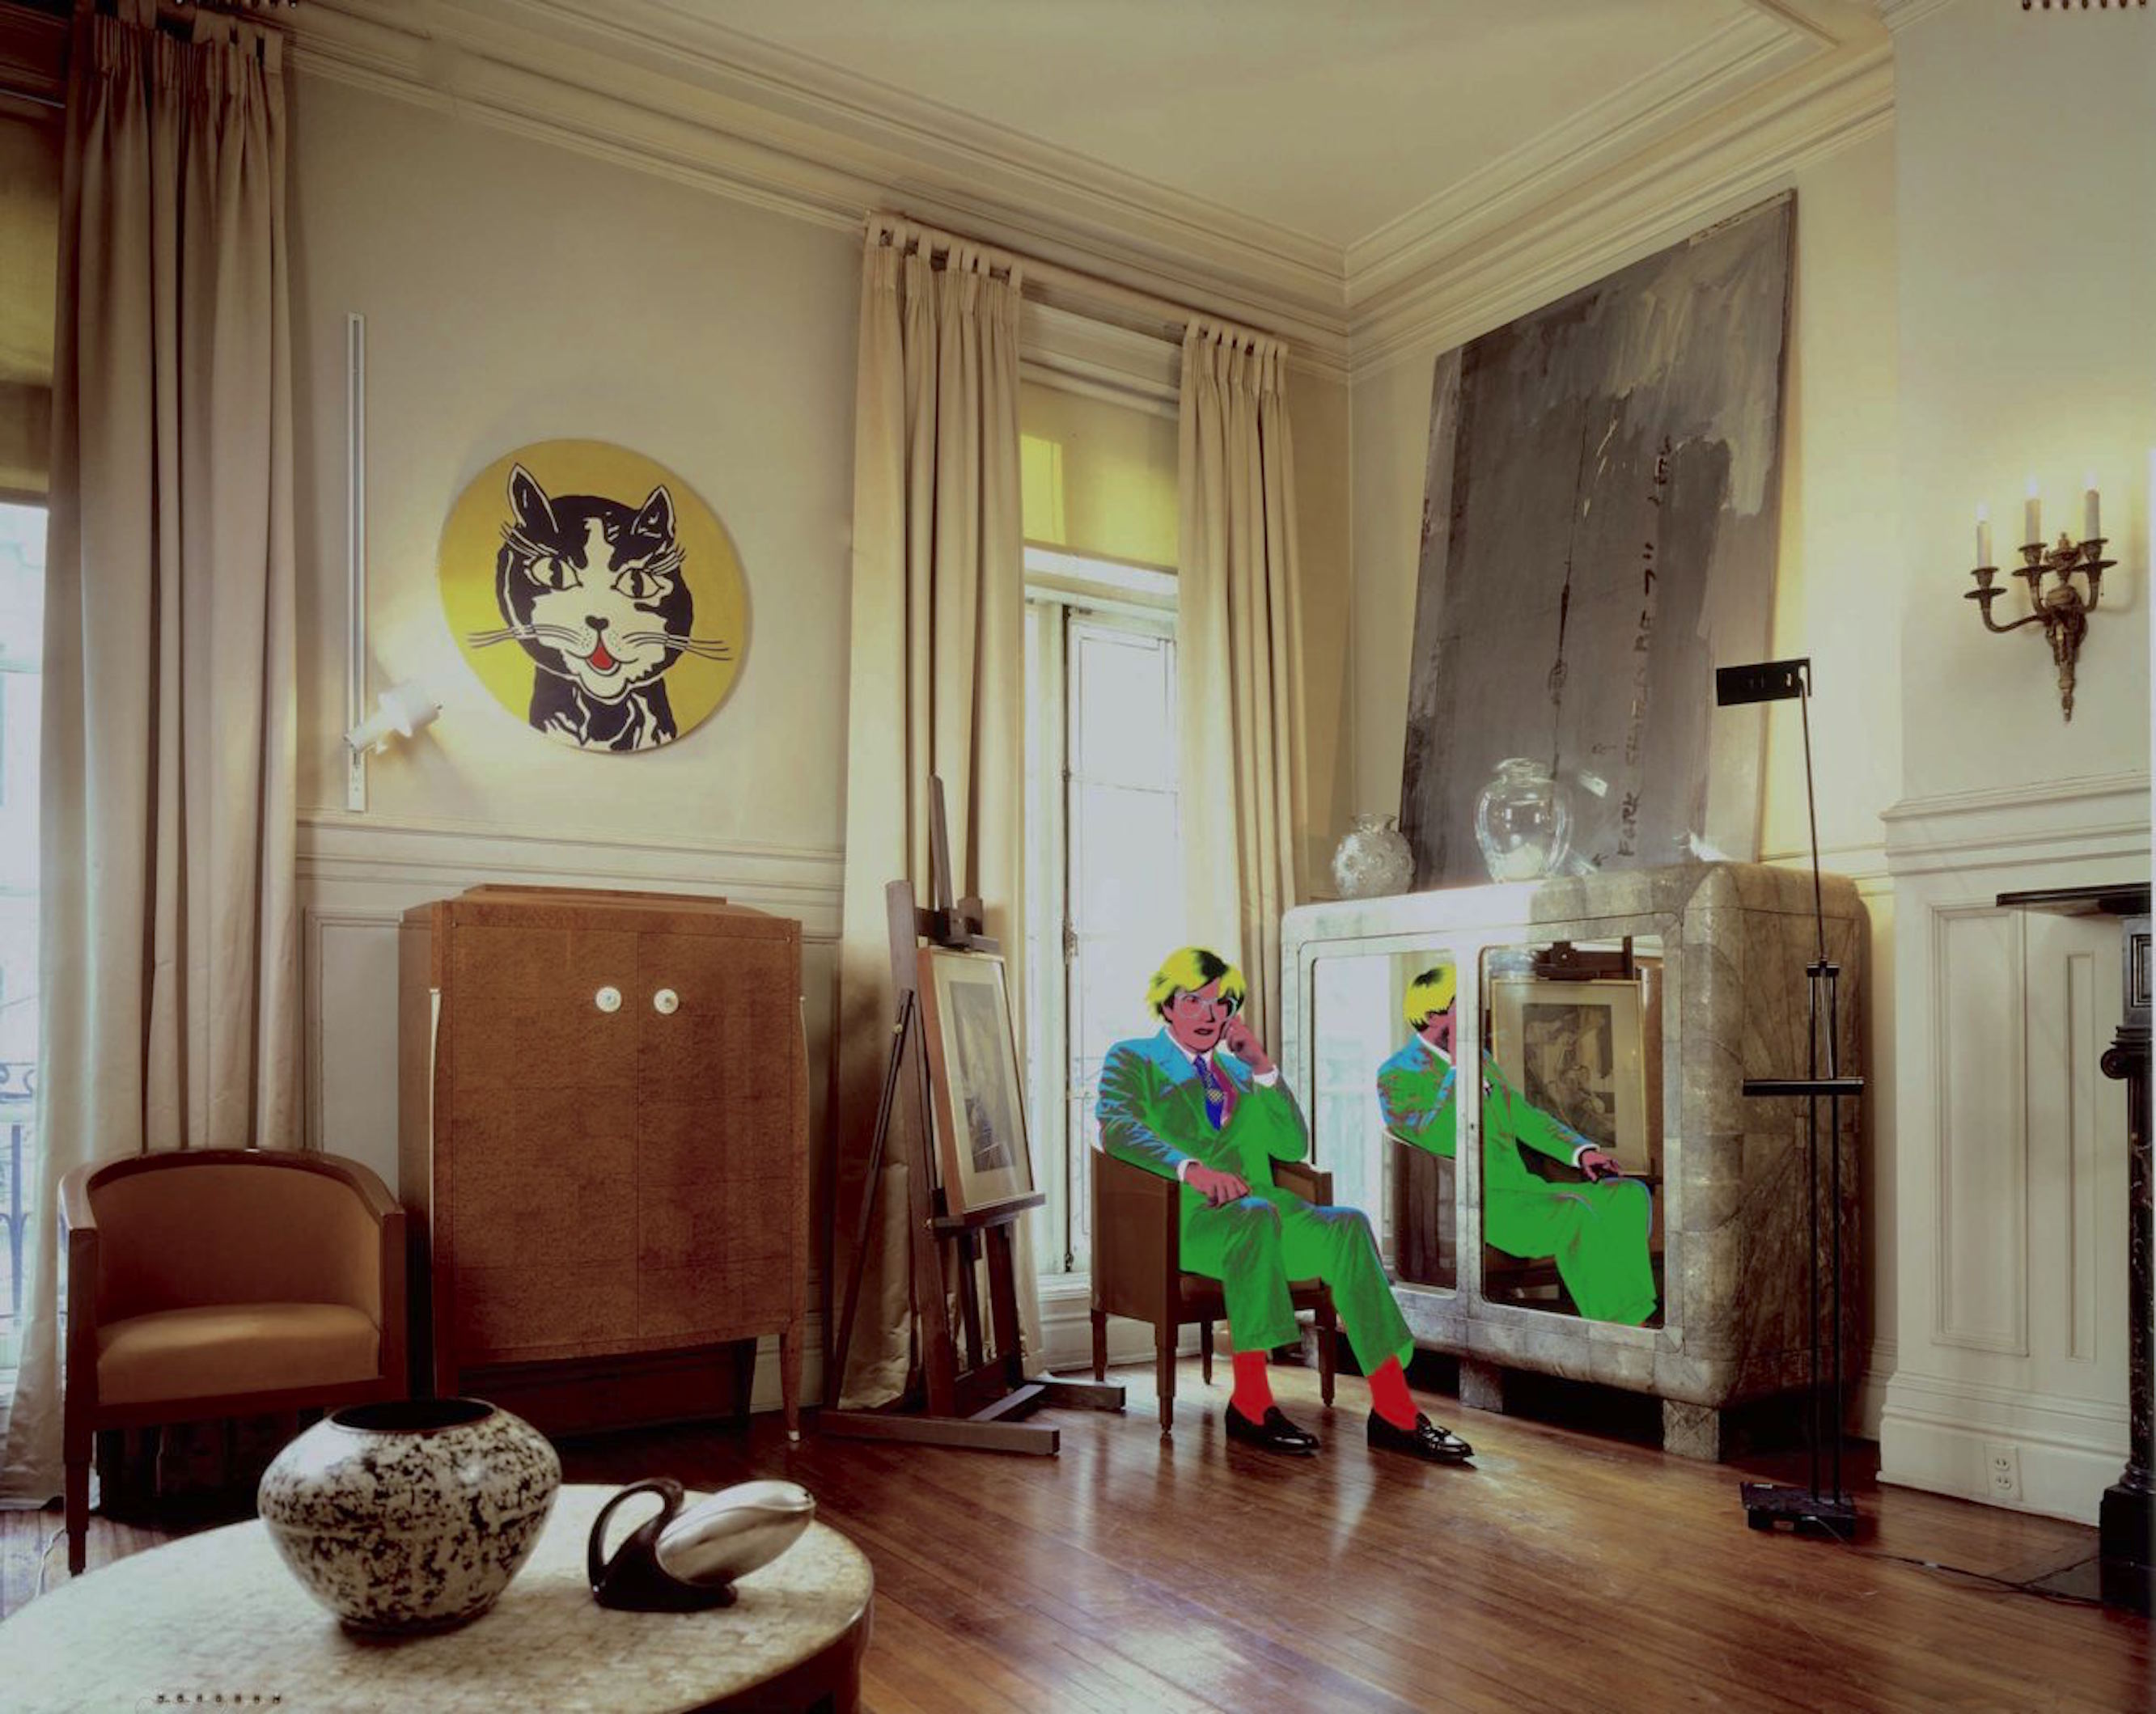 Andy Warhol's Living Room